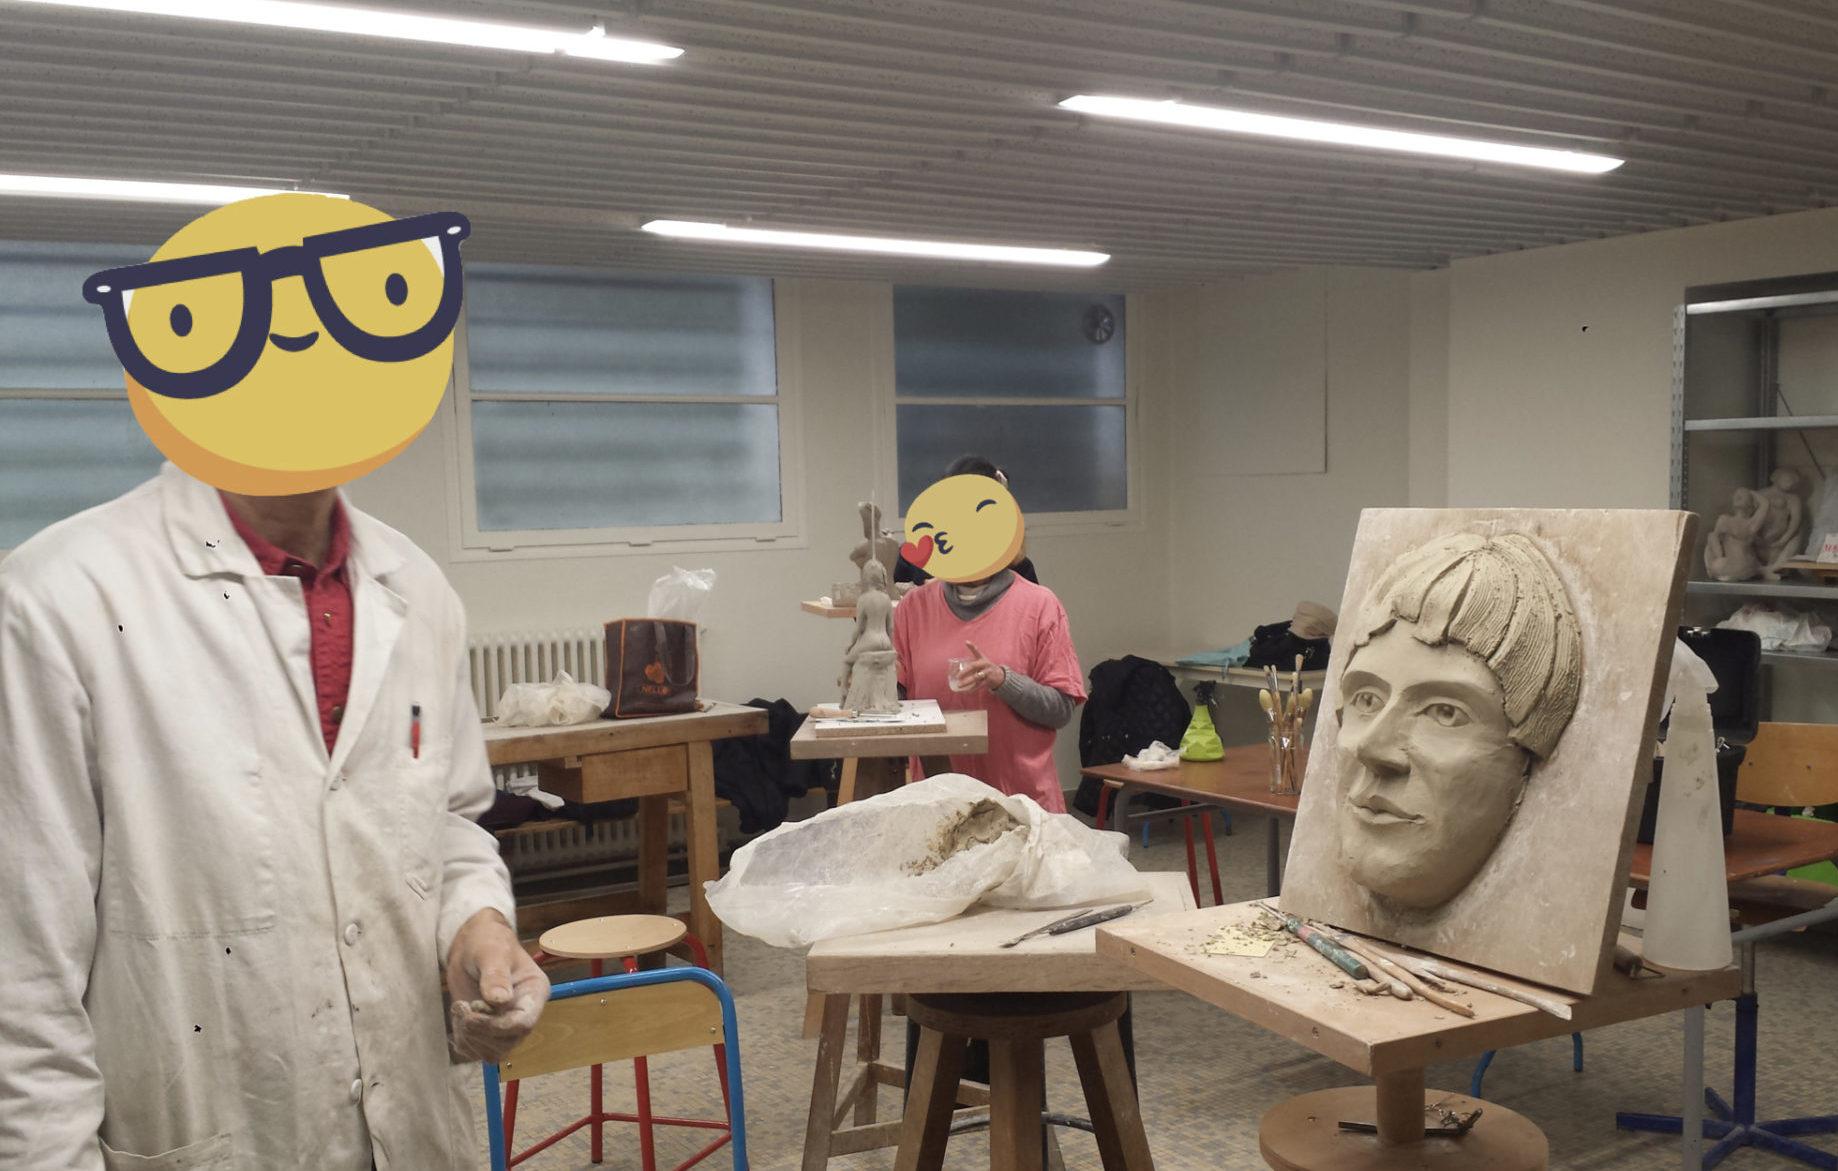 atelier sculpture modelage cours adultes orsay